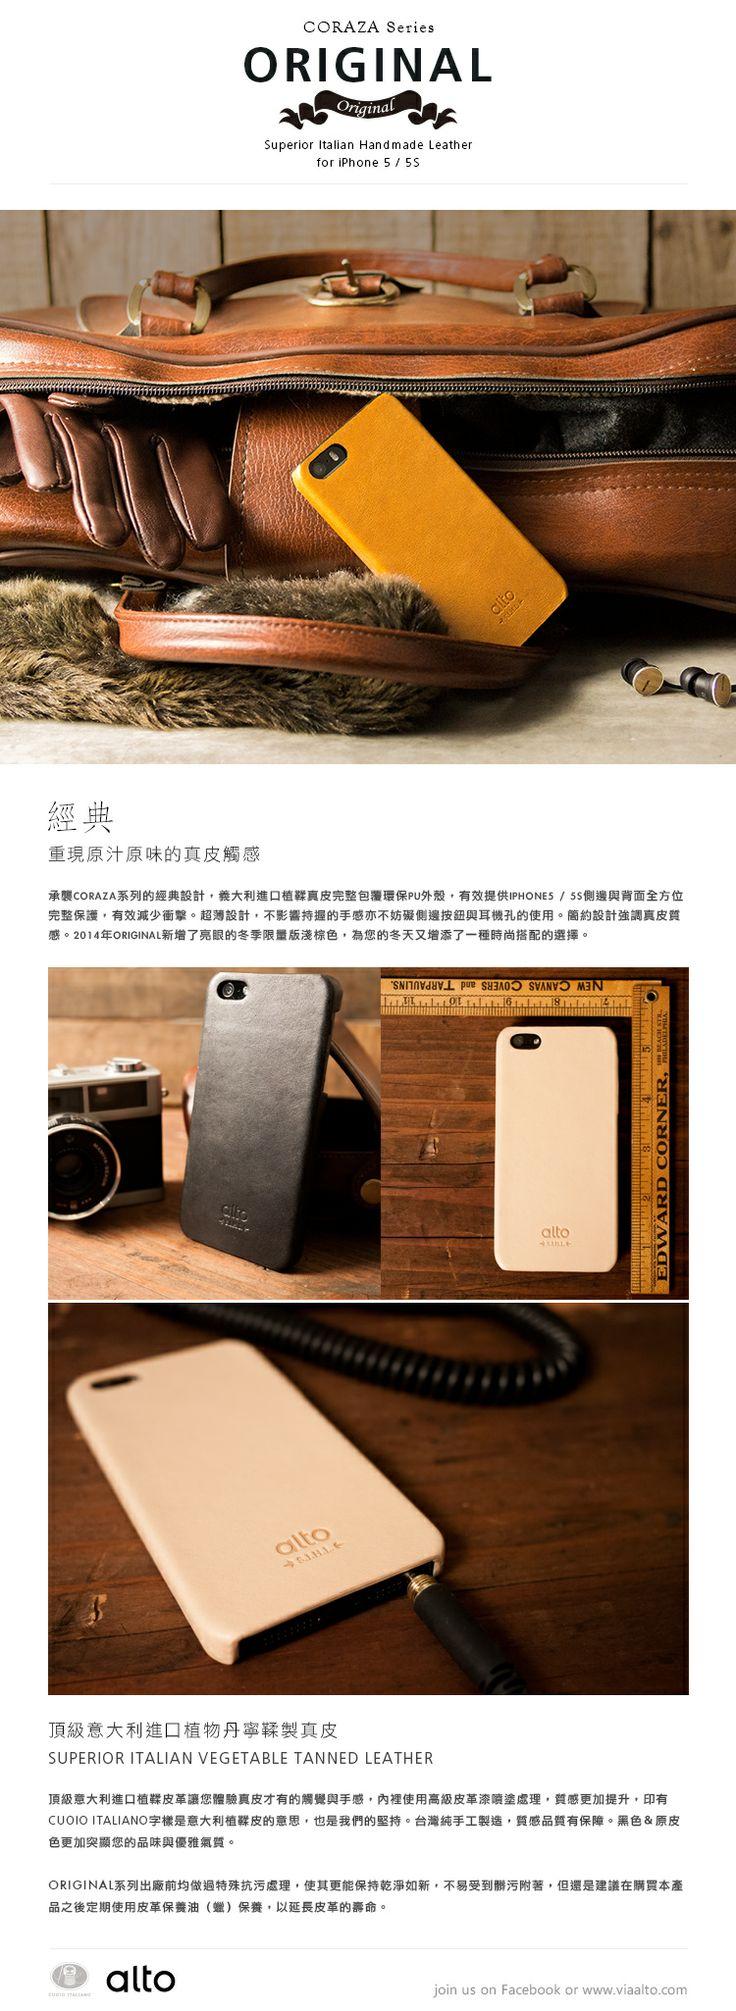 alto iPhone 5/5S 真皮手機背蓋,Coraza Original - 淺棕 [可客製雷雕文字,需加購] - alto   Pinkoi